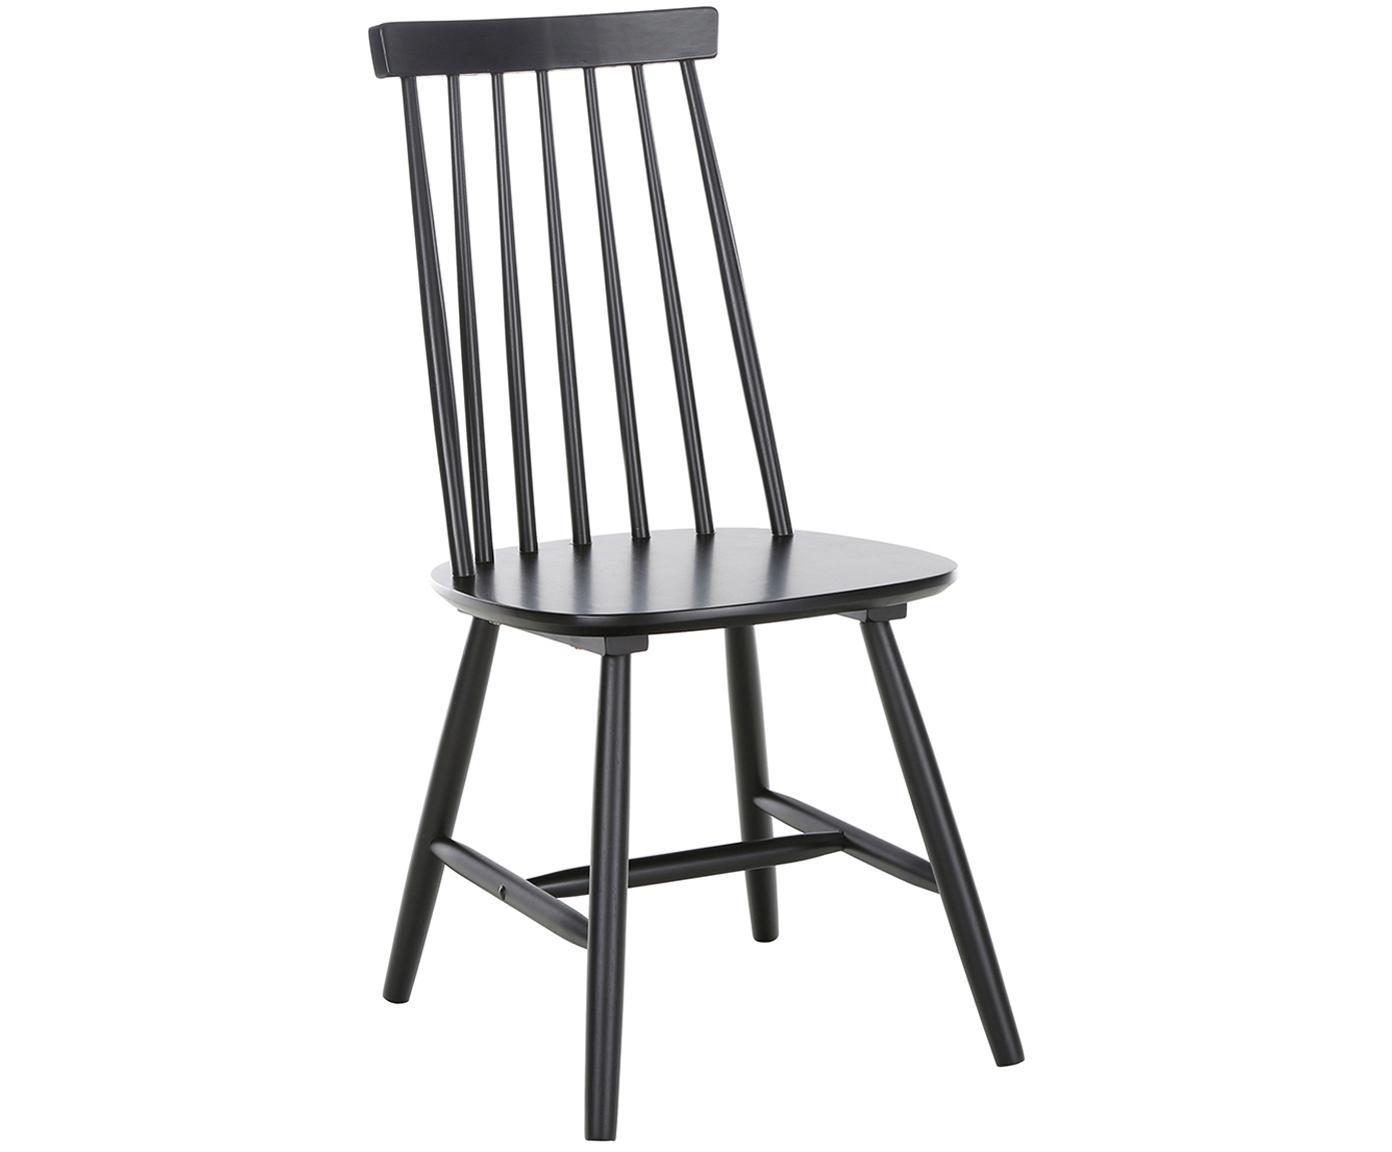 Houten stoelen Milas, 2 stuks, Gelakt rubberhout, Zwart, B 52 x D 45 cm